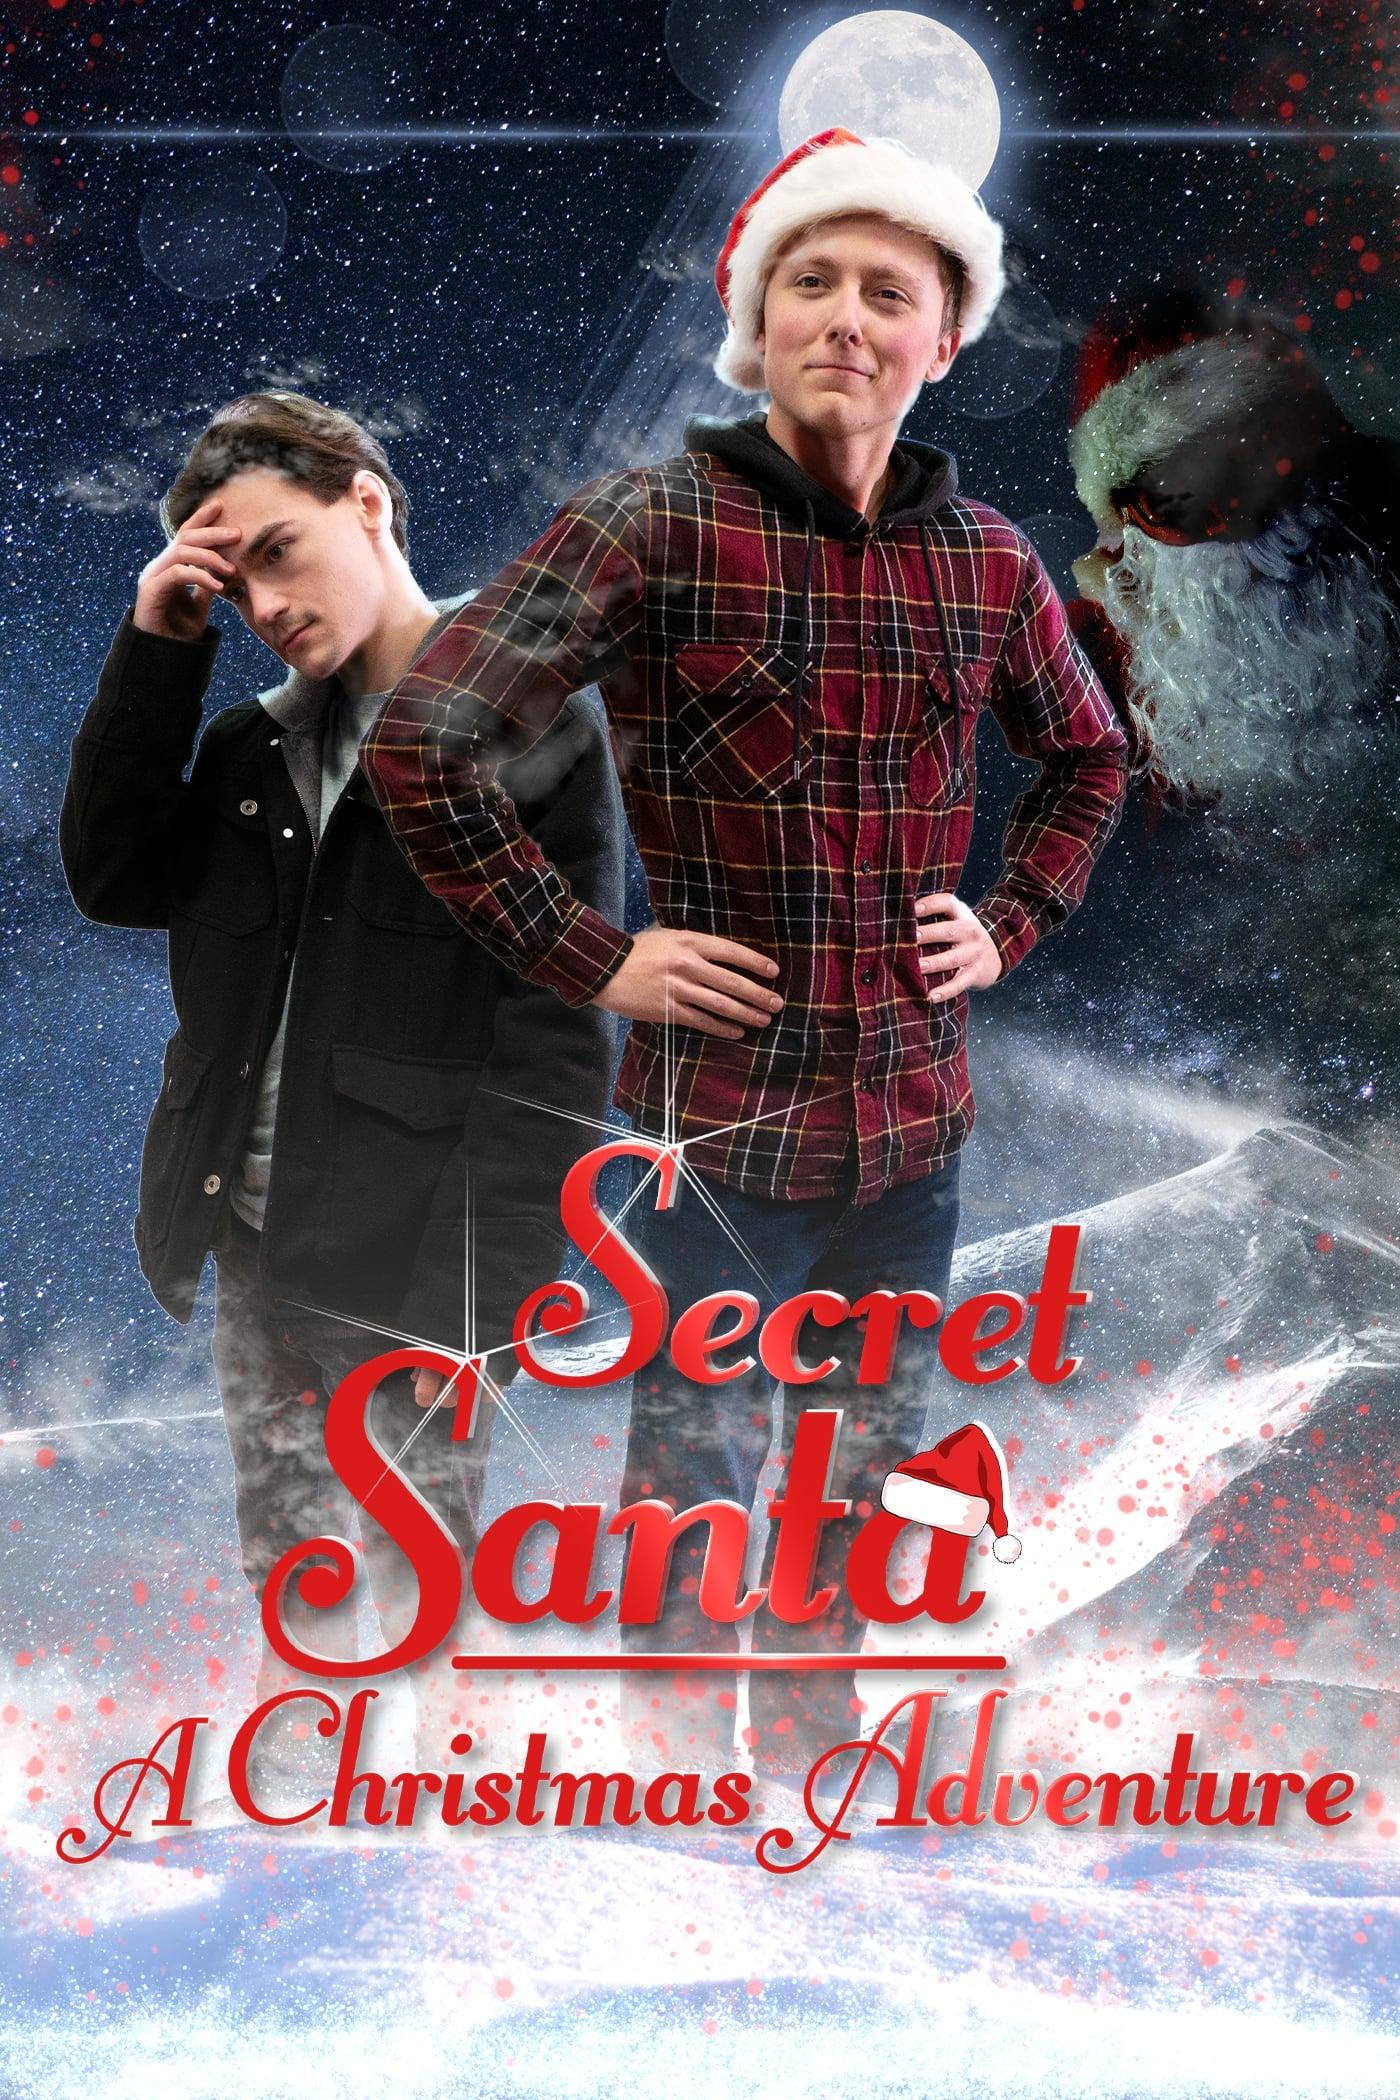 Secret Santa: A Christmas Adventure